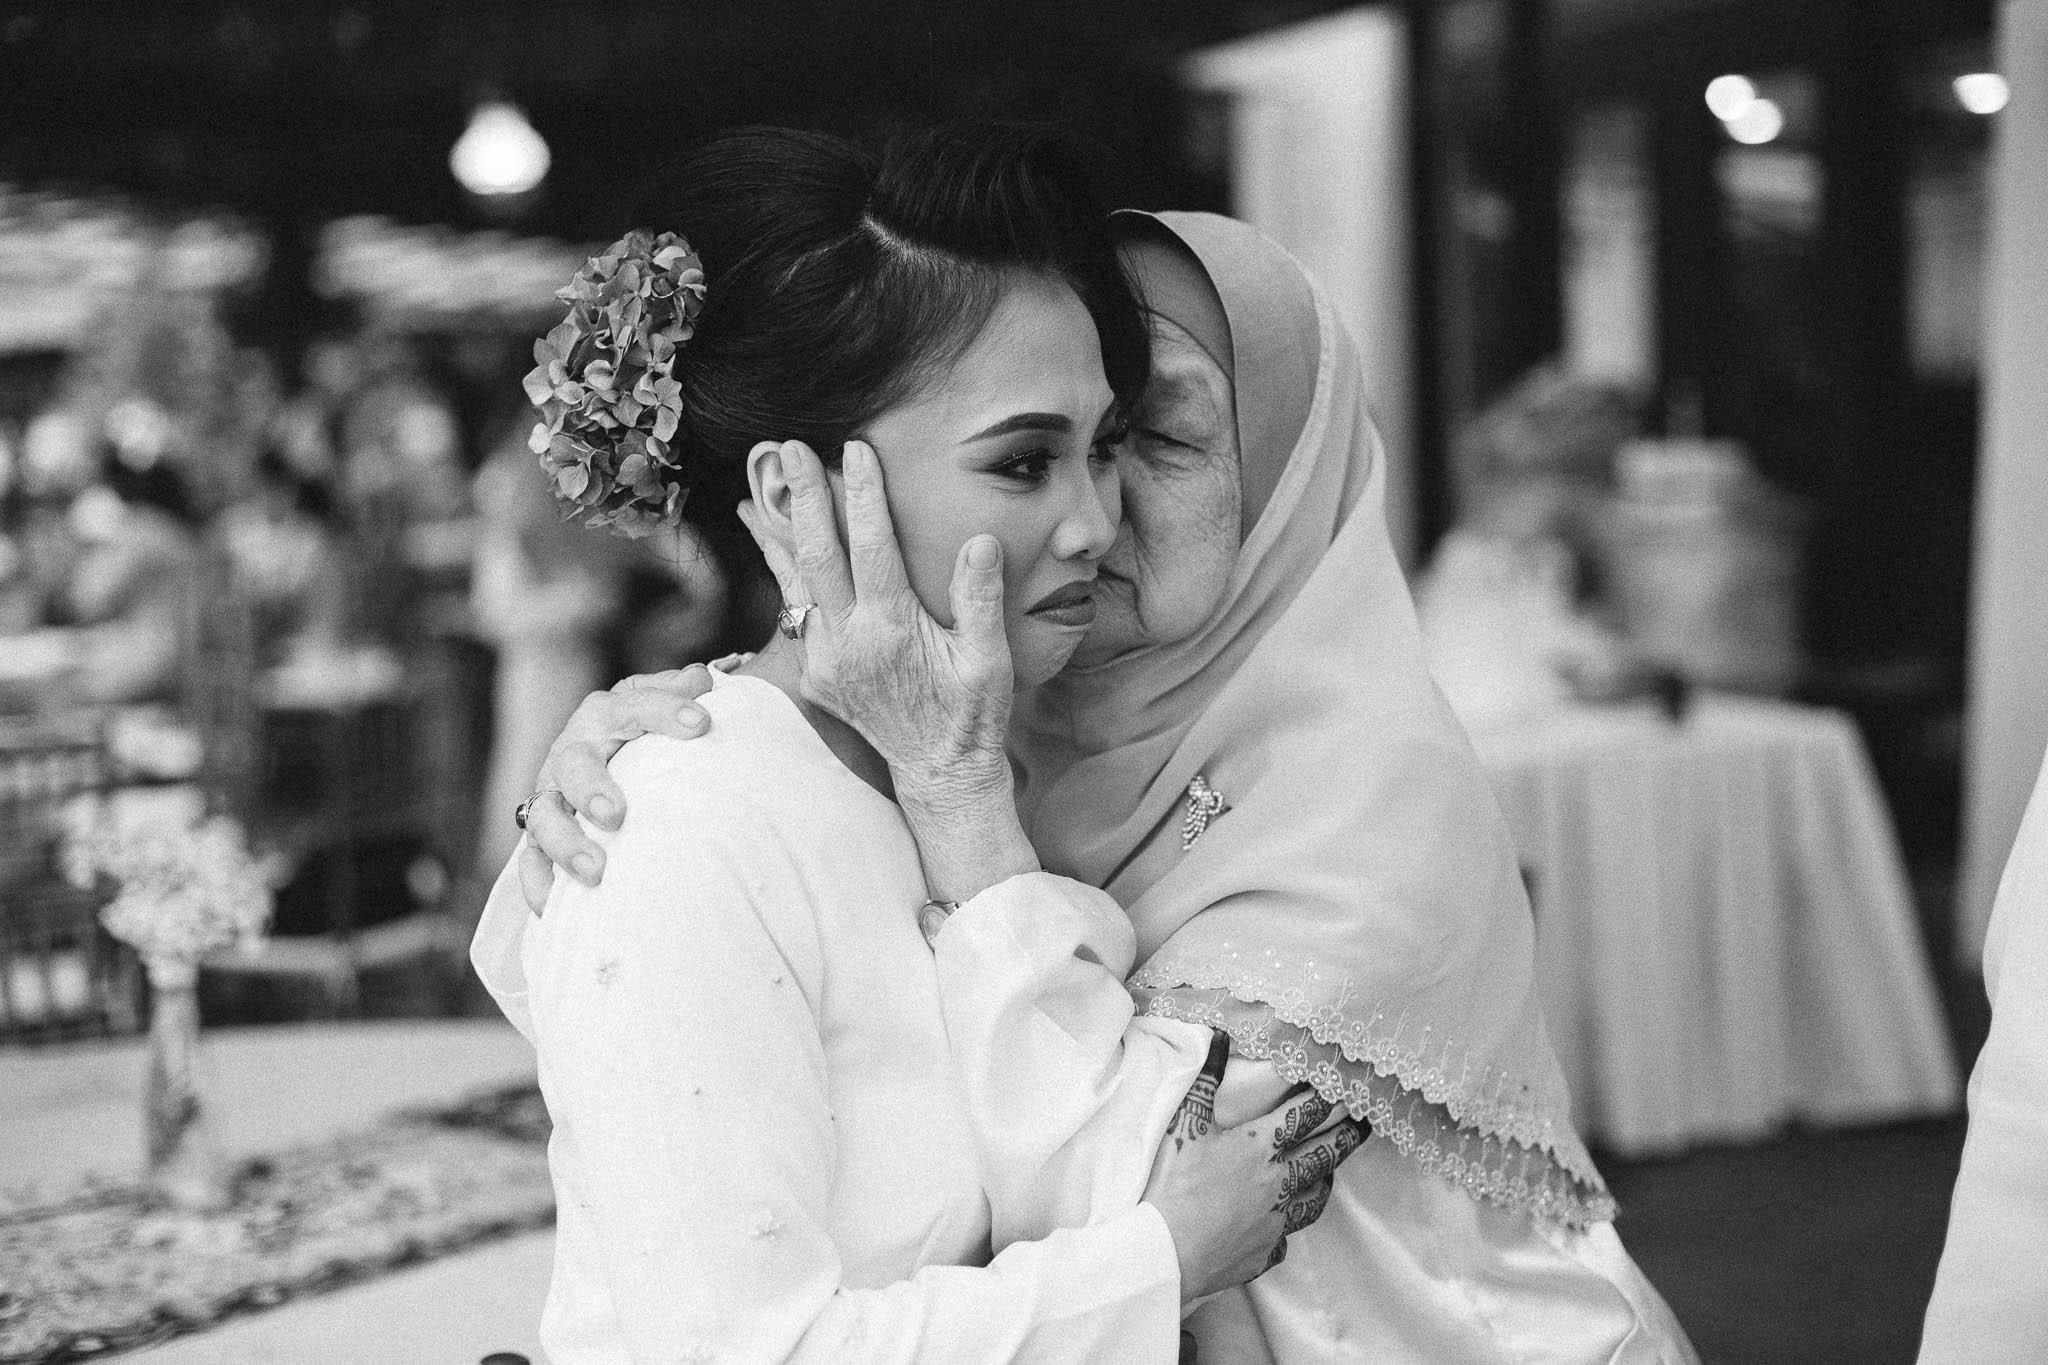 singapore-wedding-photographer-malay-indian-pre-wedding-travel-wmt-2015-56.jpg